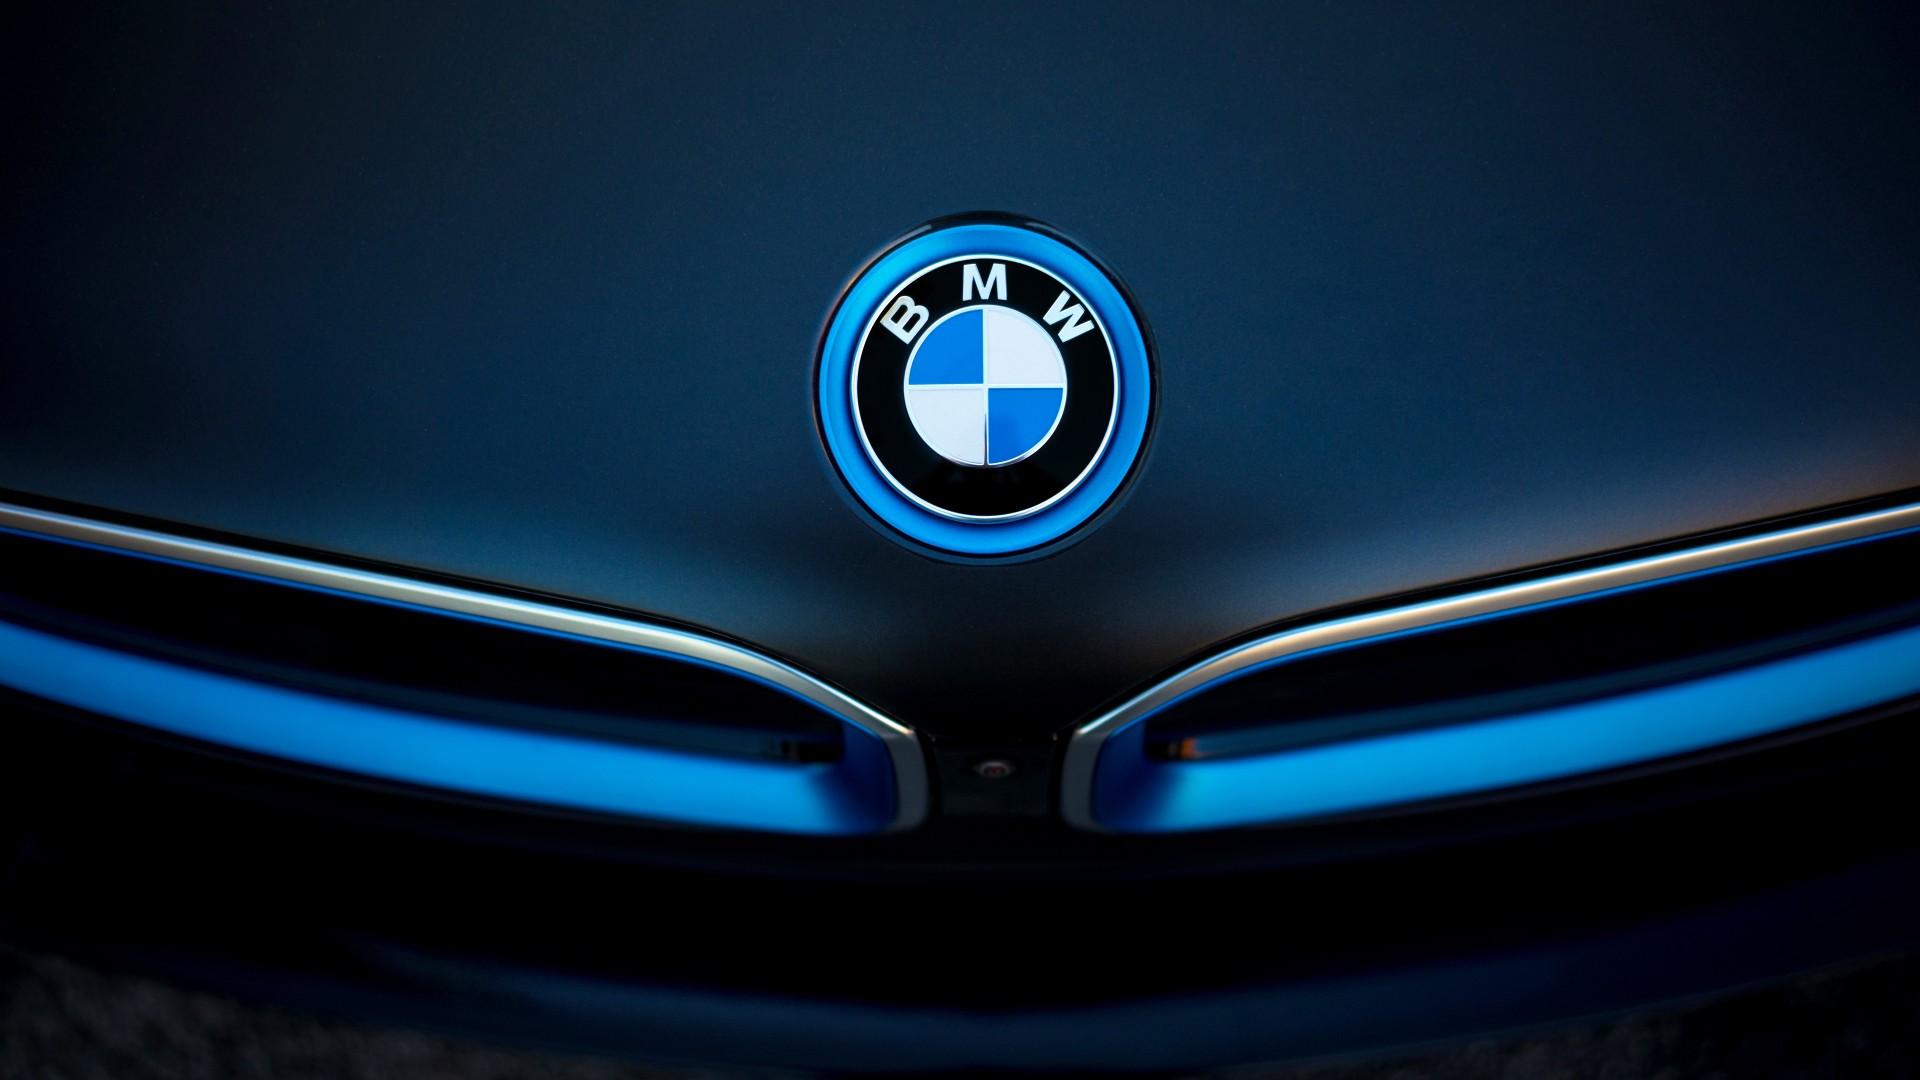 BMW i8 Badge Wallpaper | HD Car Wallpapers | ID #5540